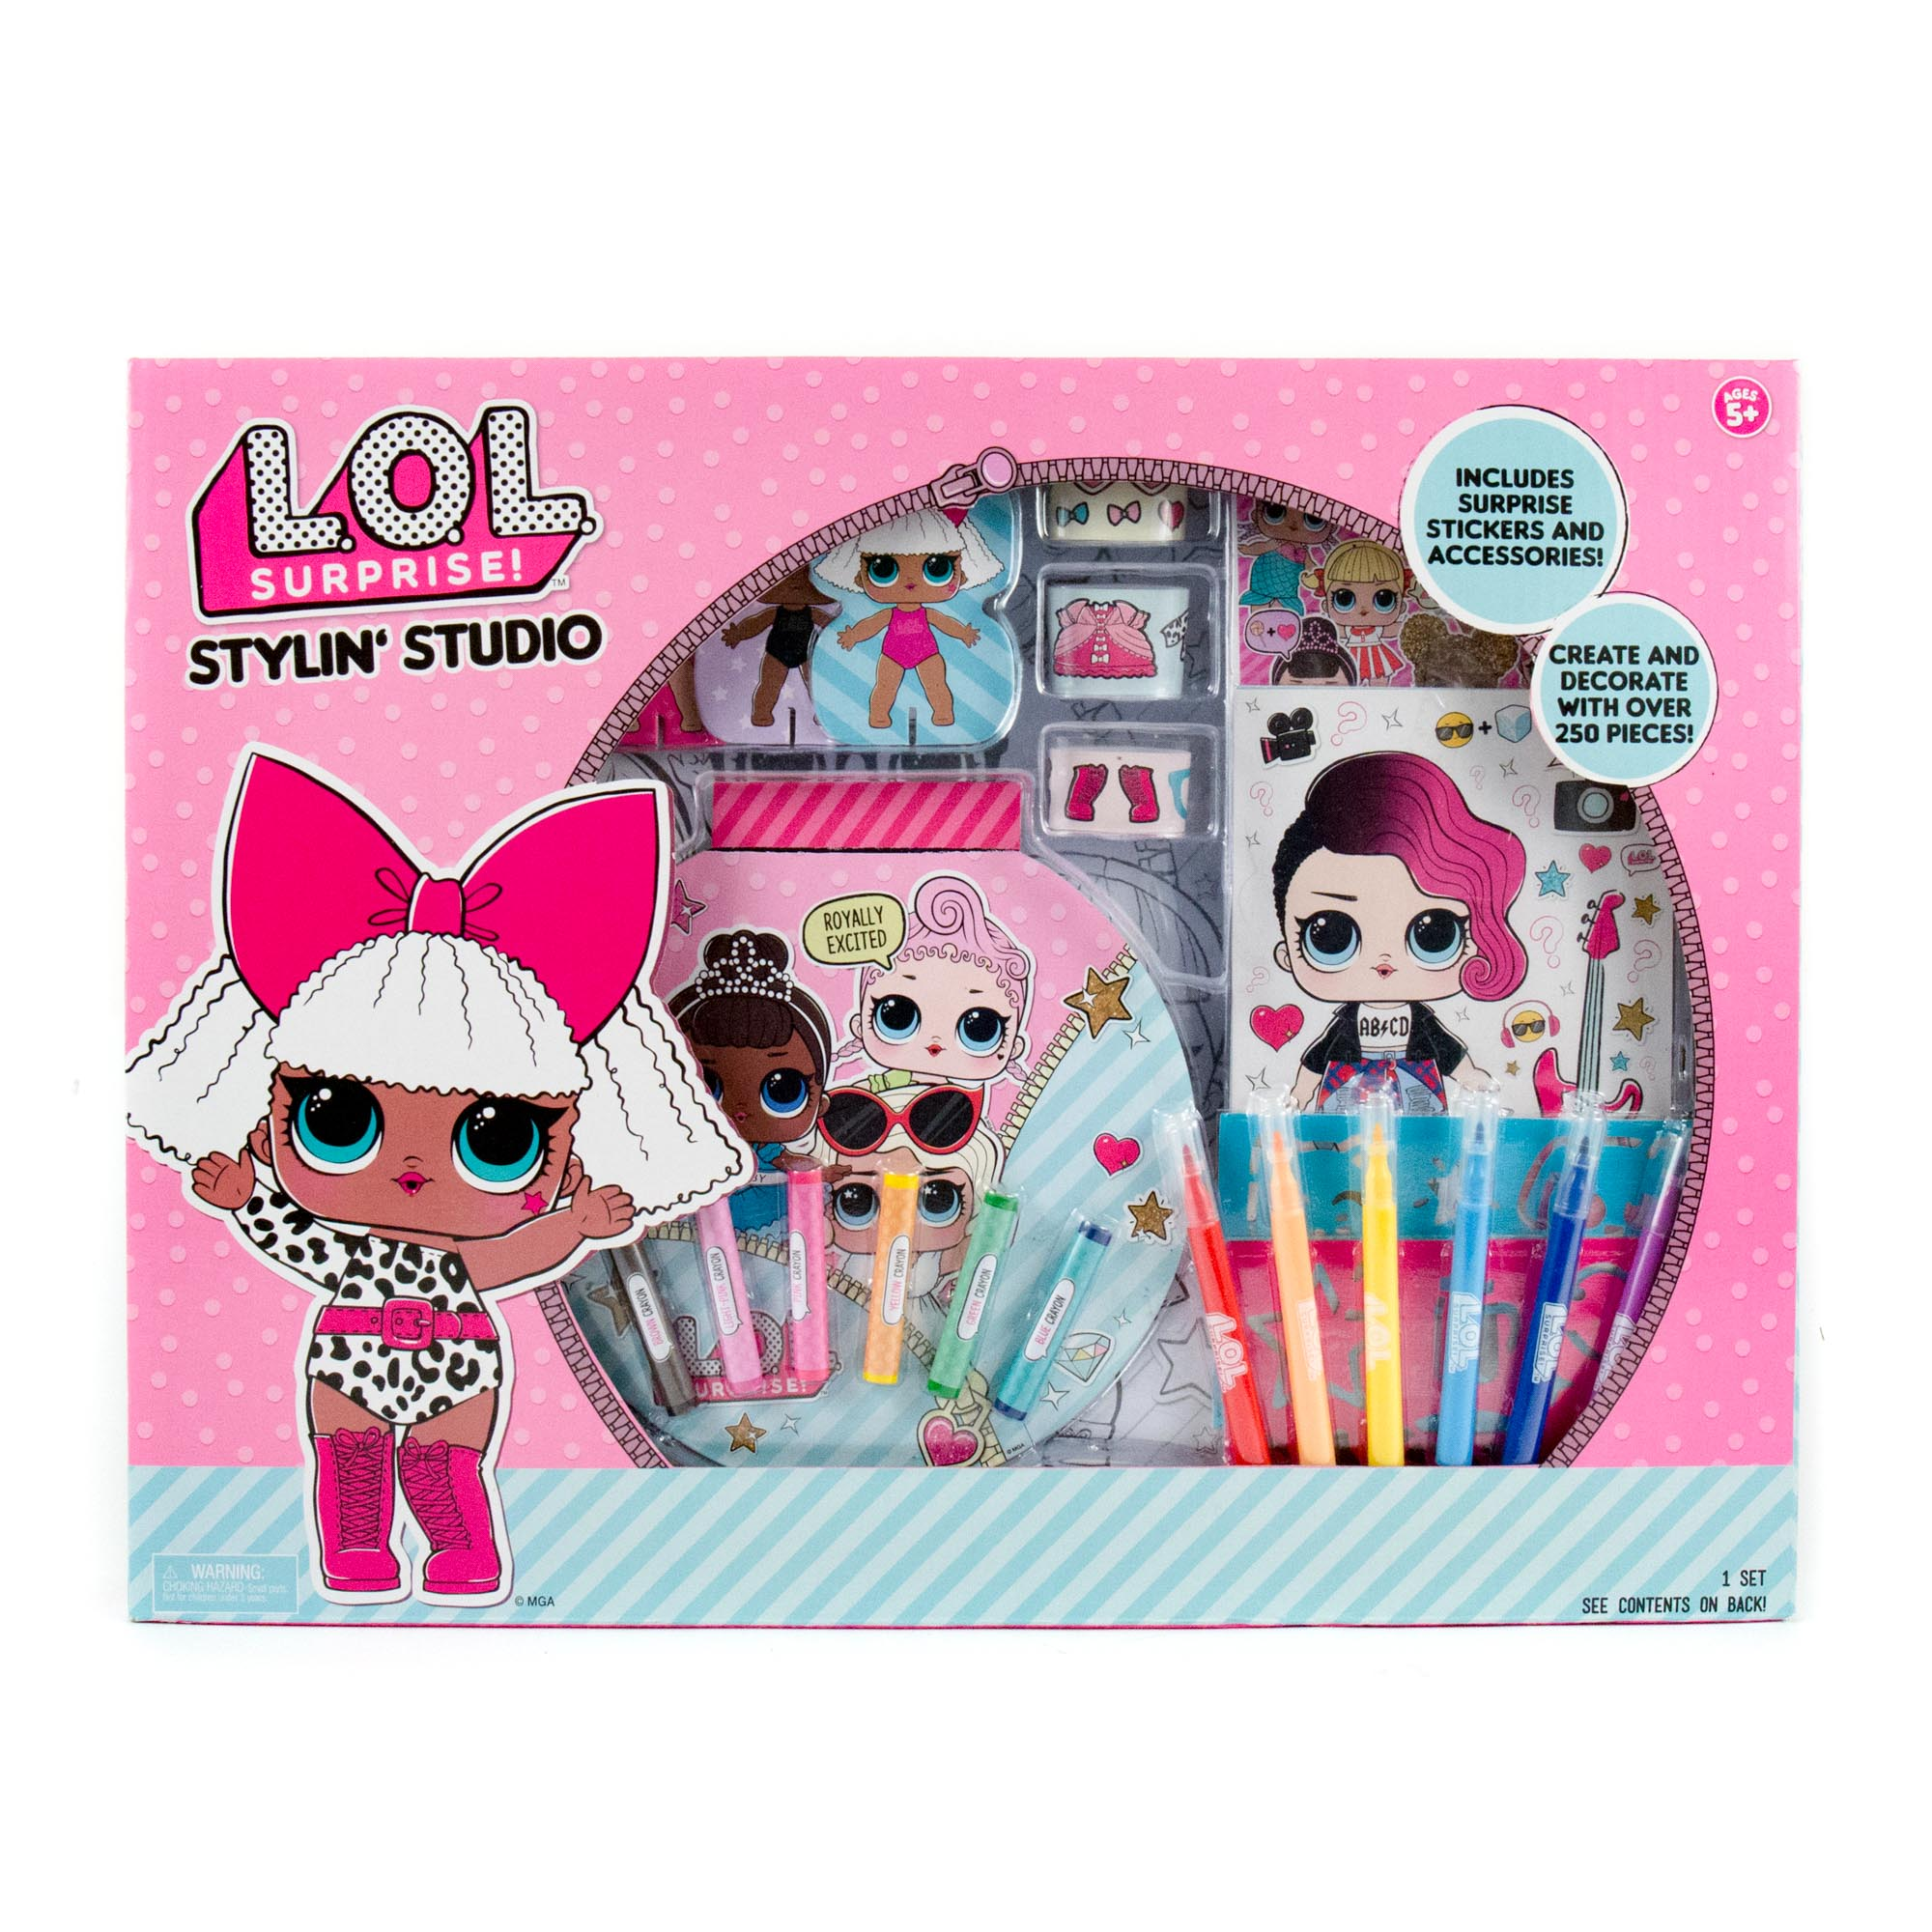 LOL Surprise Stylin' Art Studio by Horizon Group USA